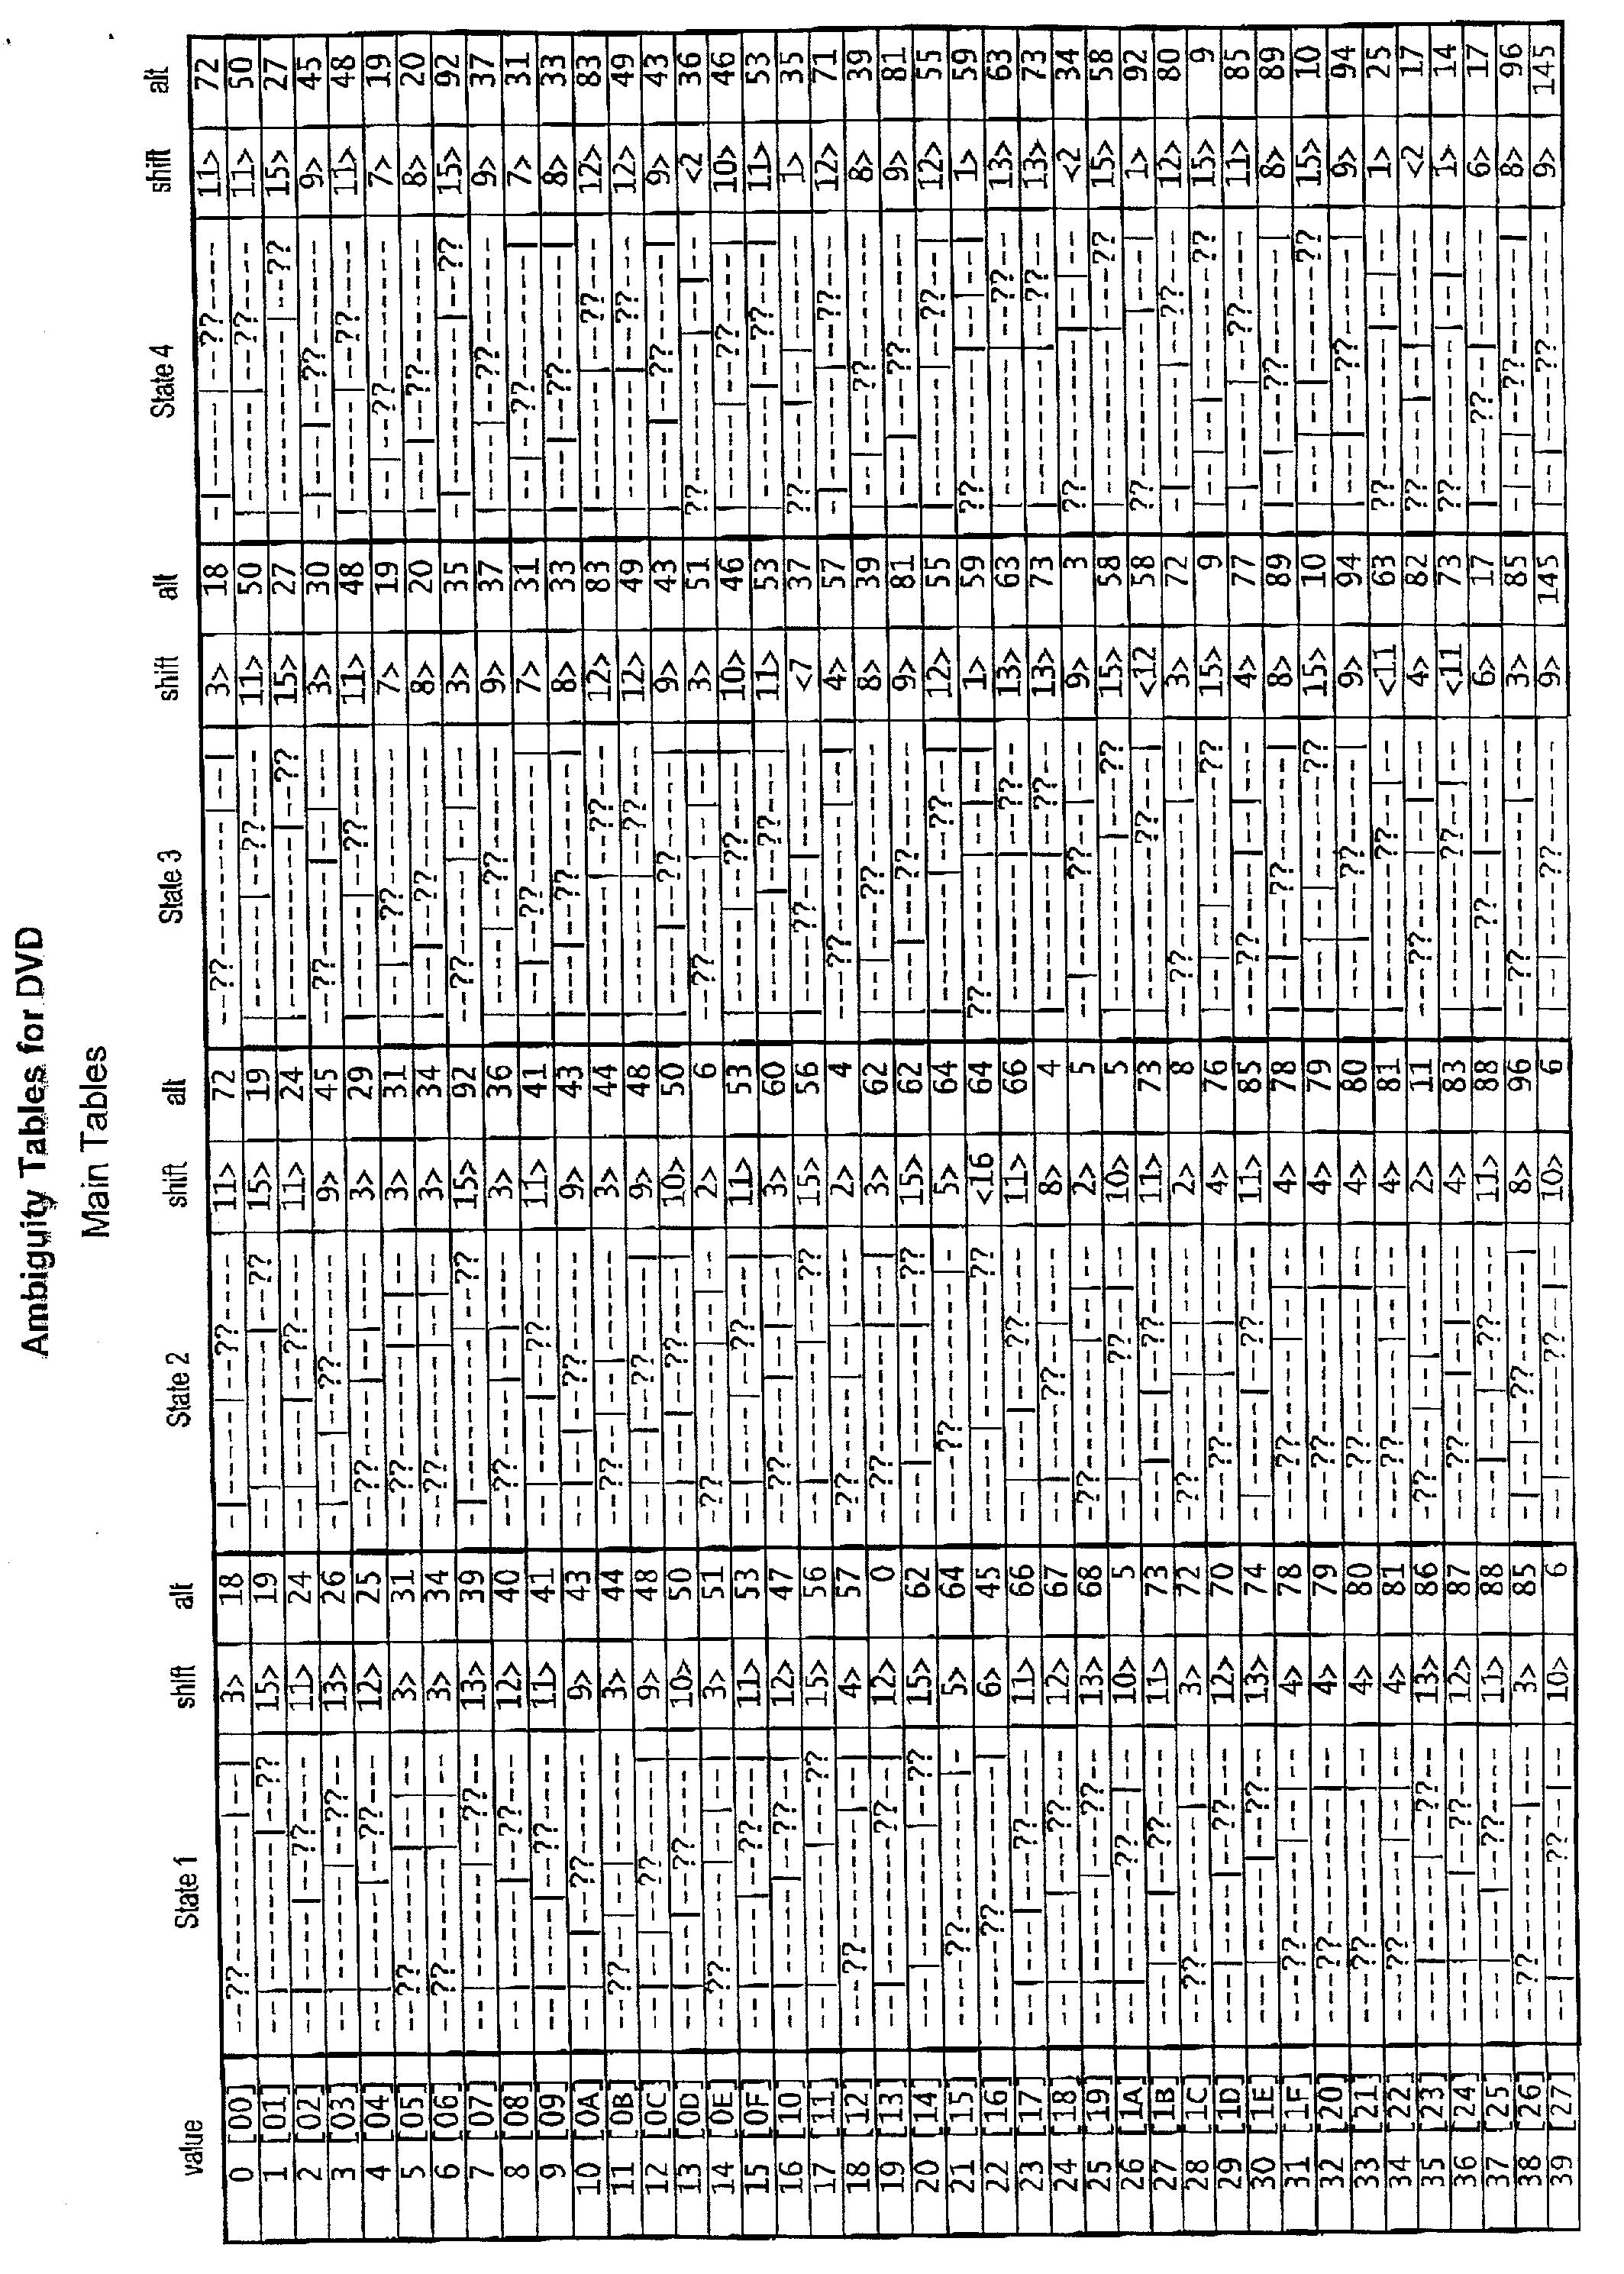 Figure US20020069389A1-20020606-P00002